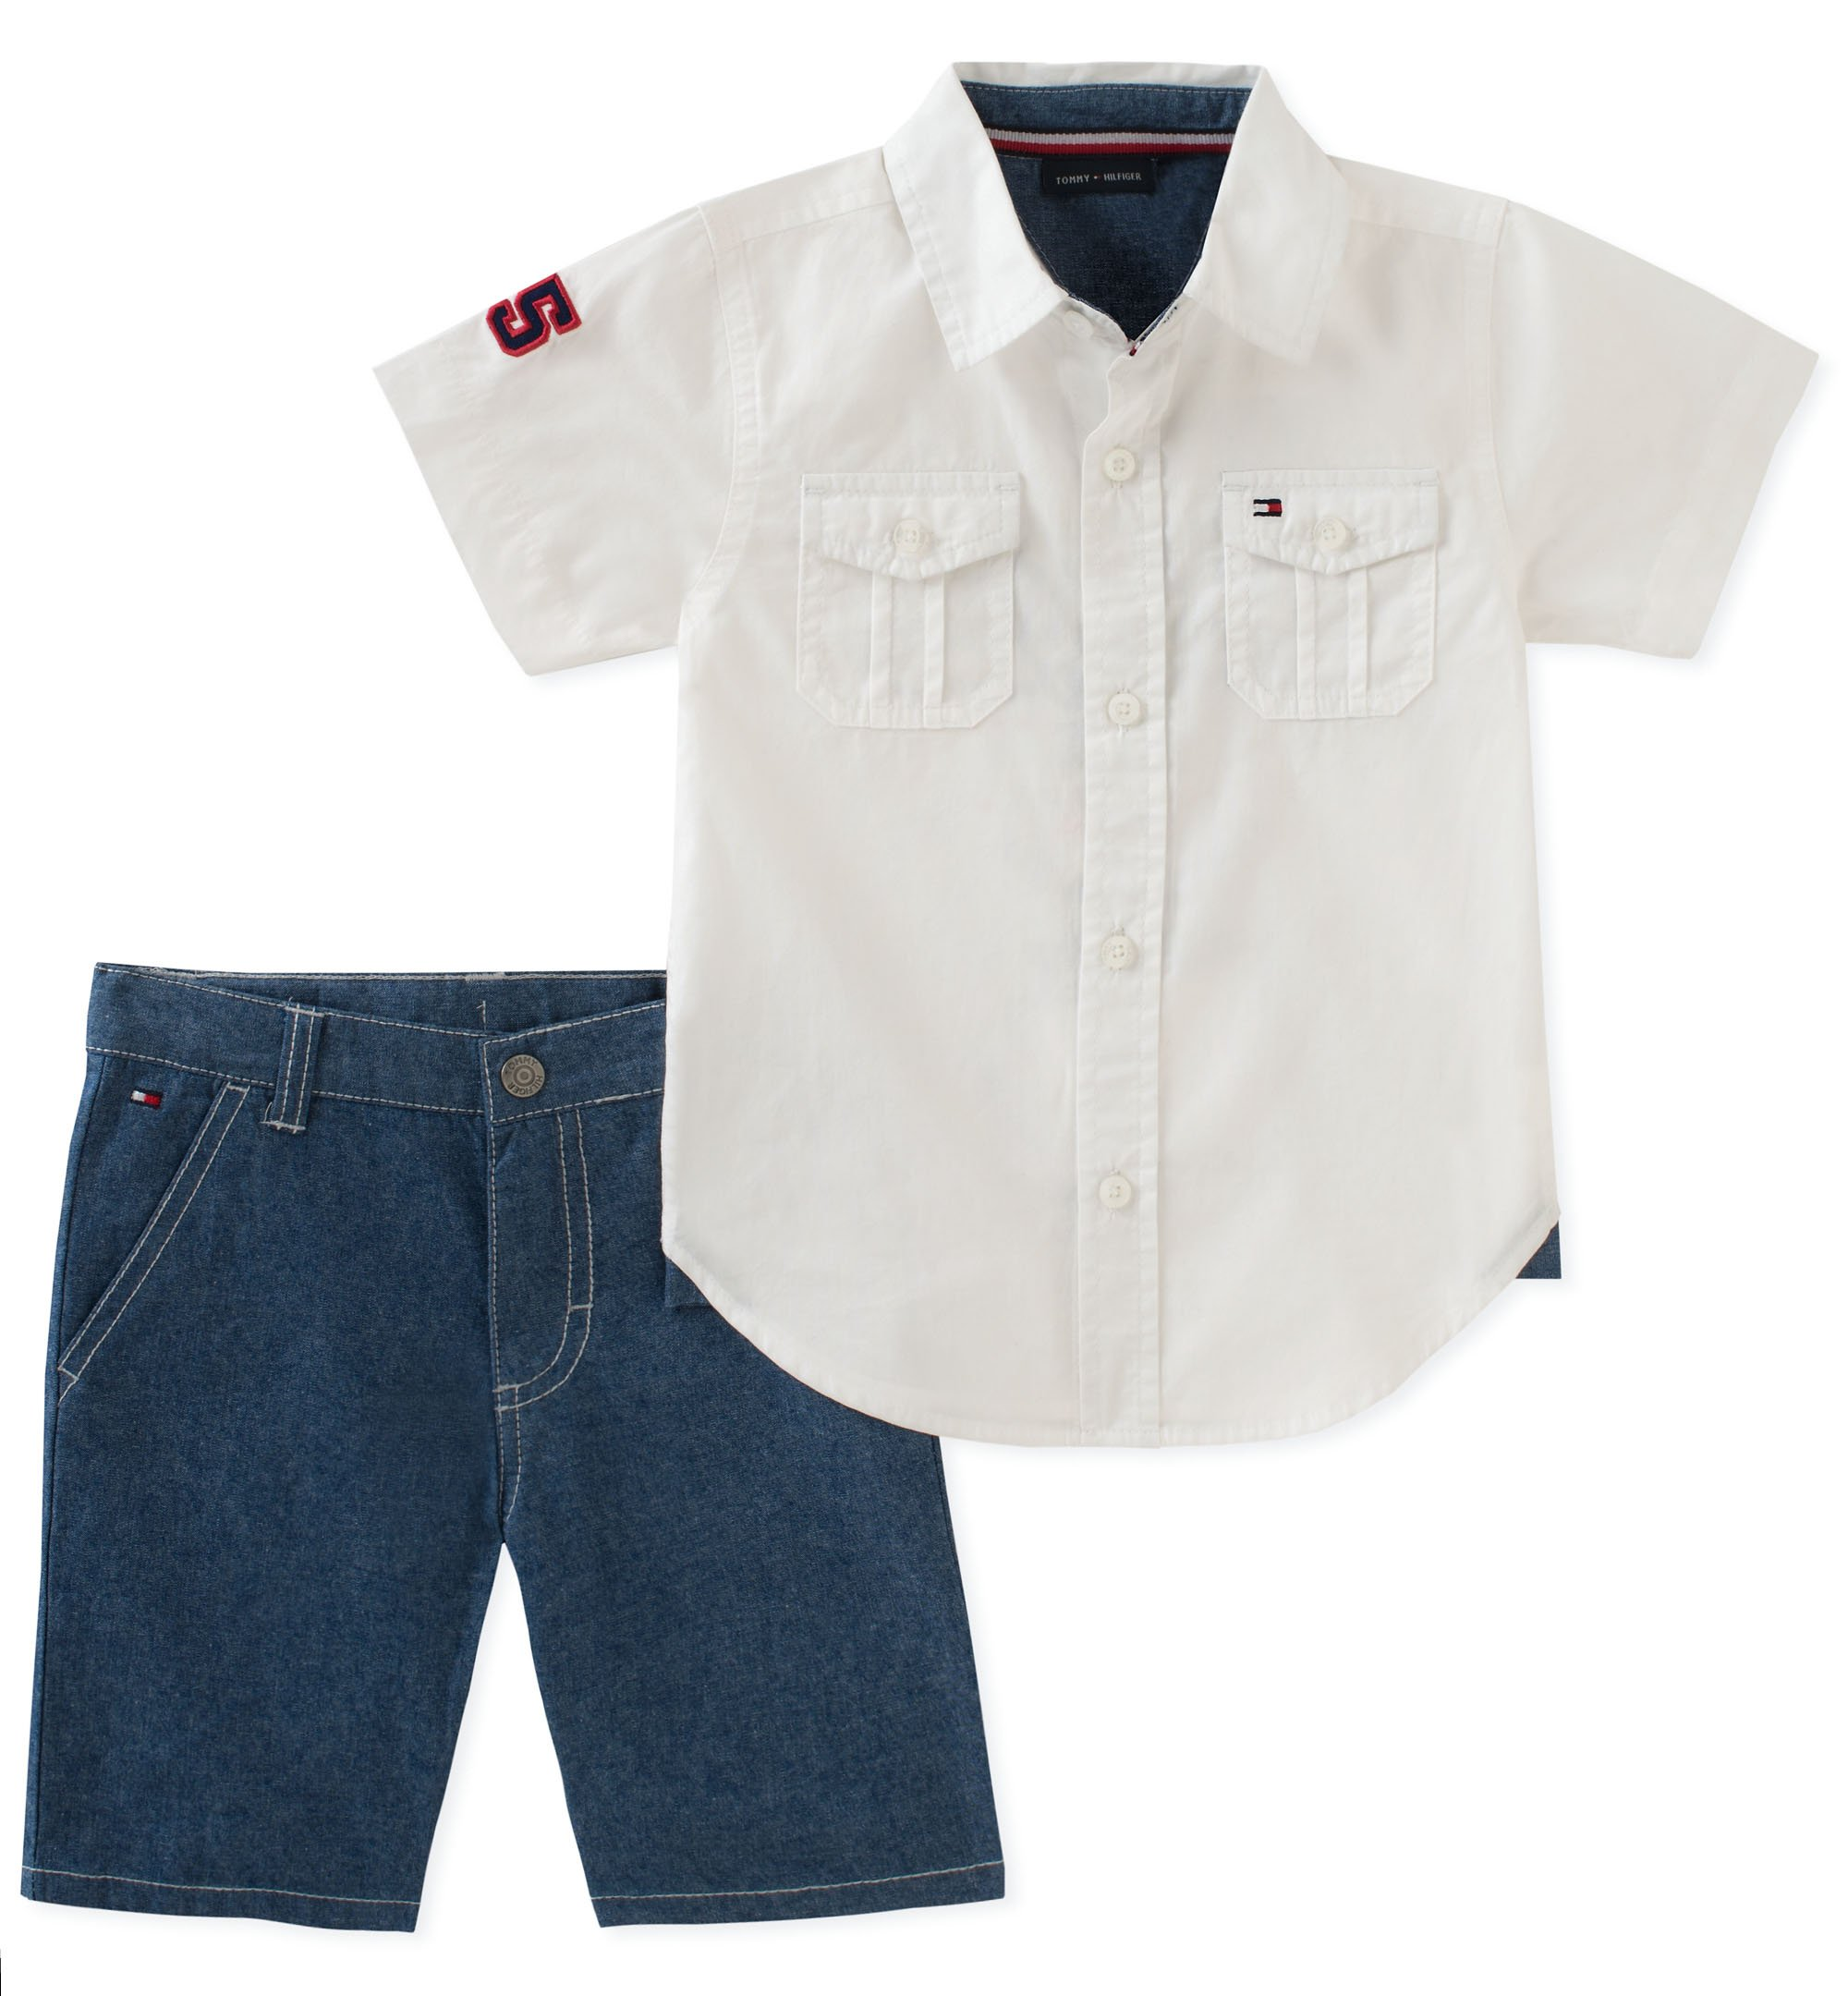 Tommy Hilfiger Toddler Boys' 2 Pieces Shirt Shorts Set, White/blue, 2T